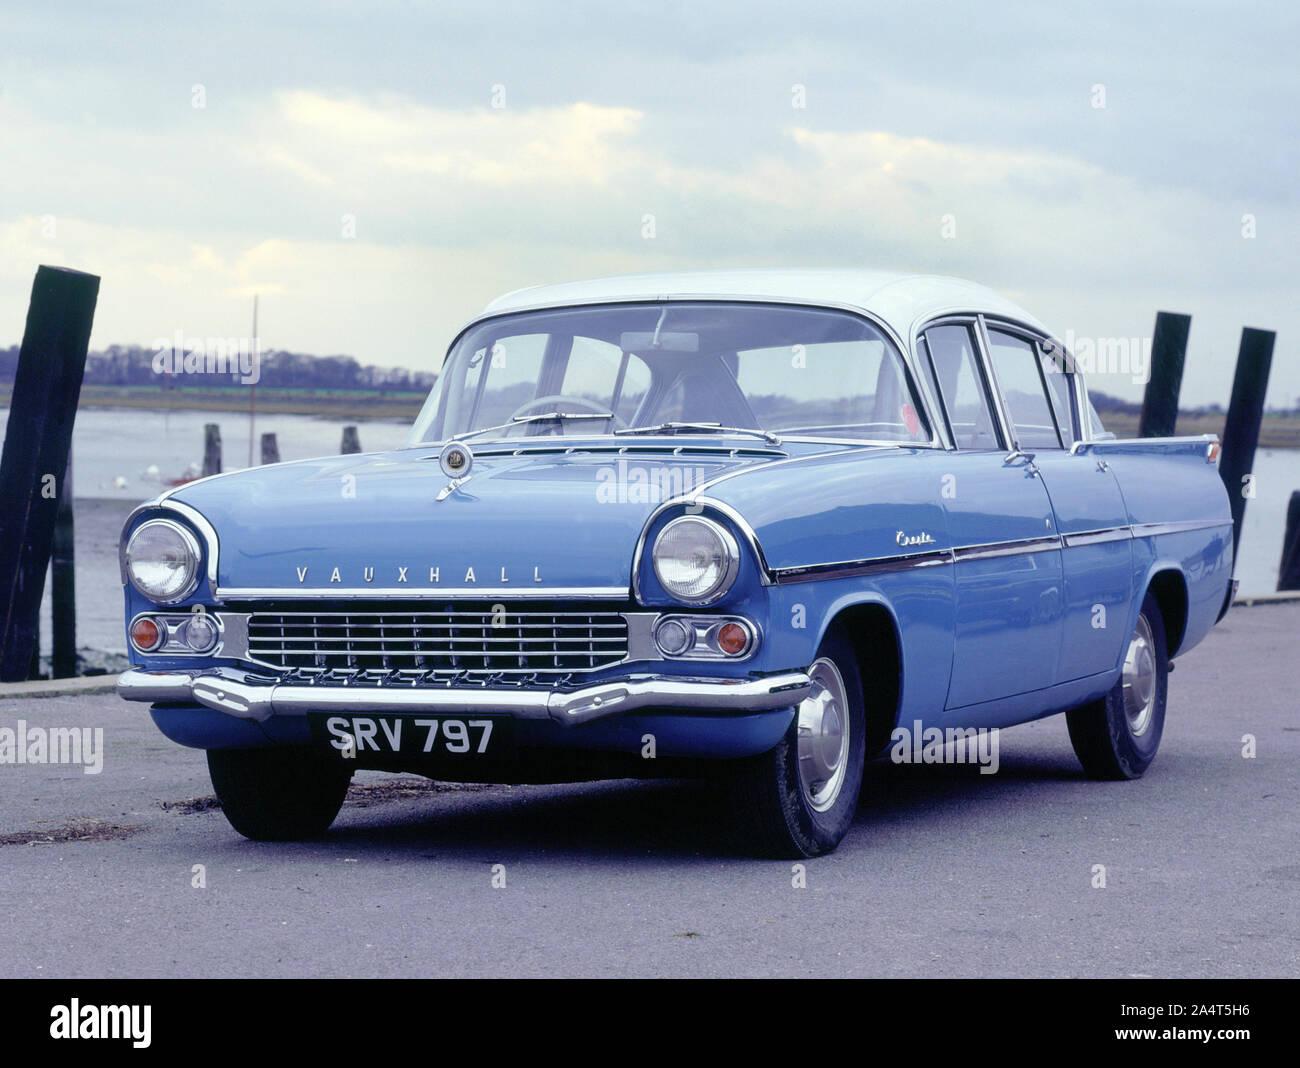 #pha.025089 Photo VAUXHALL CRESTA 4-DOOR SALOON 1960-1962 Car Auto